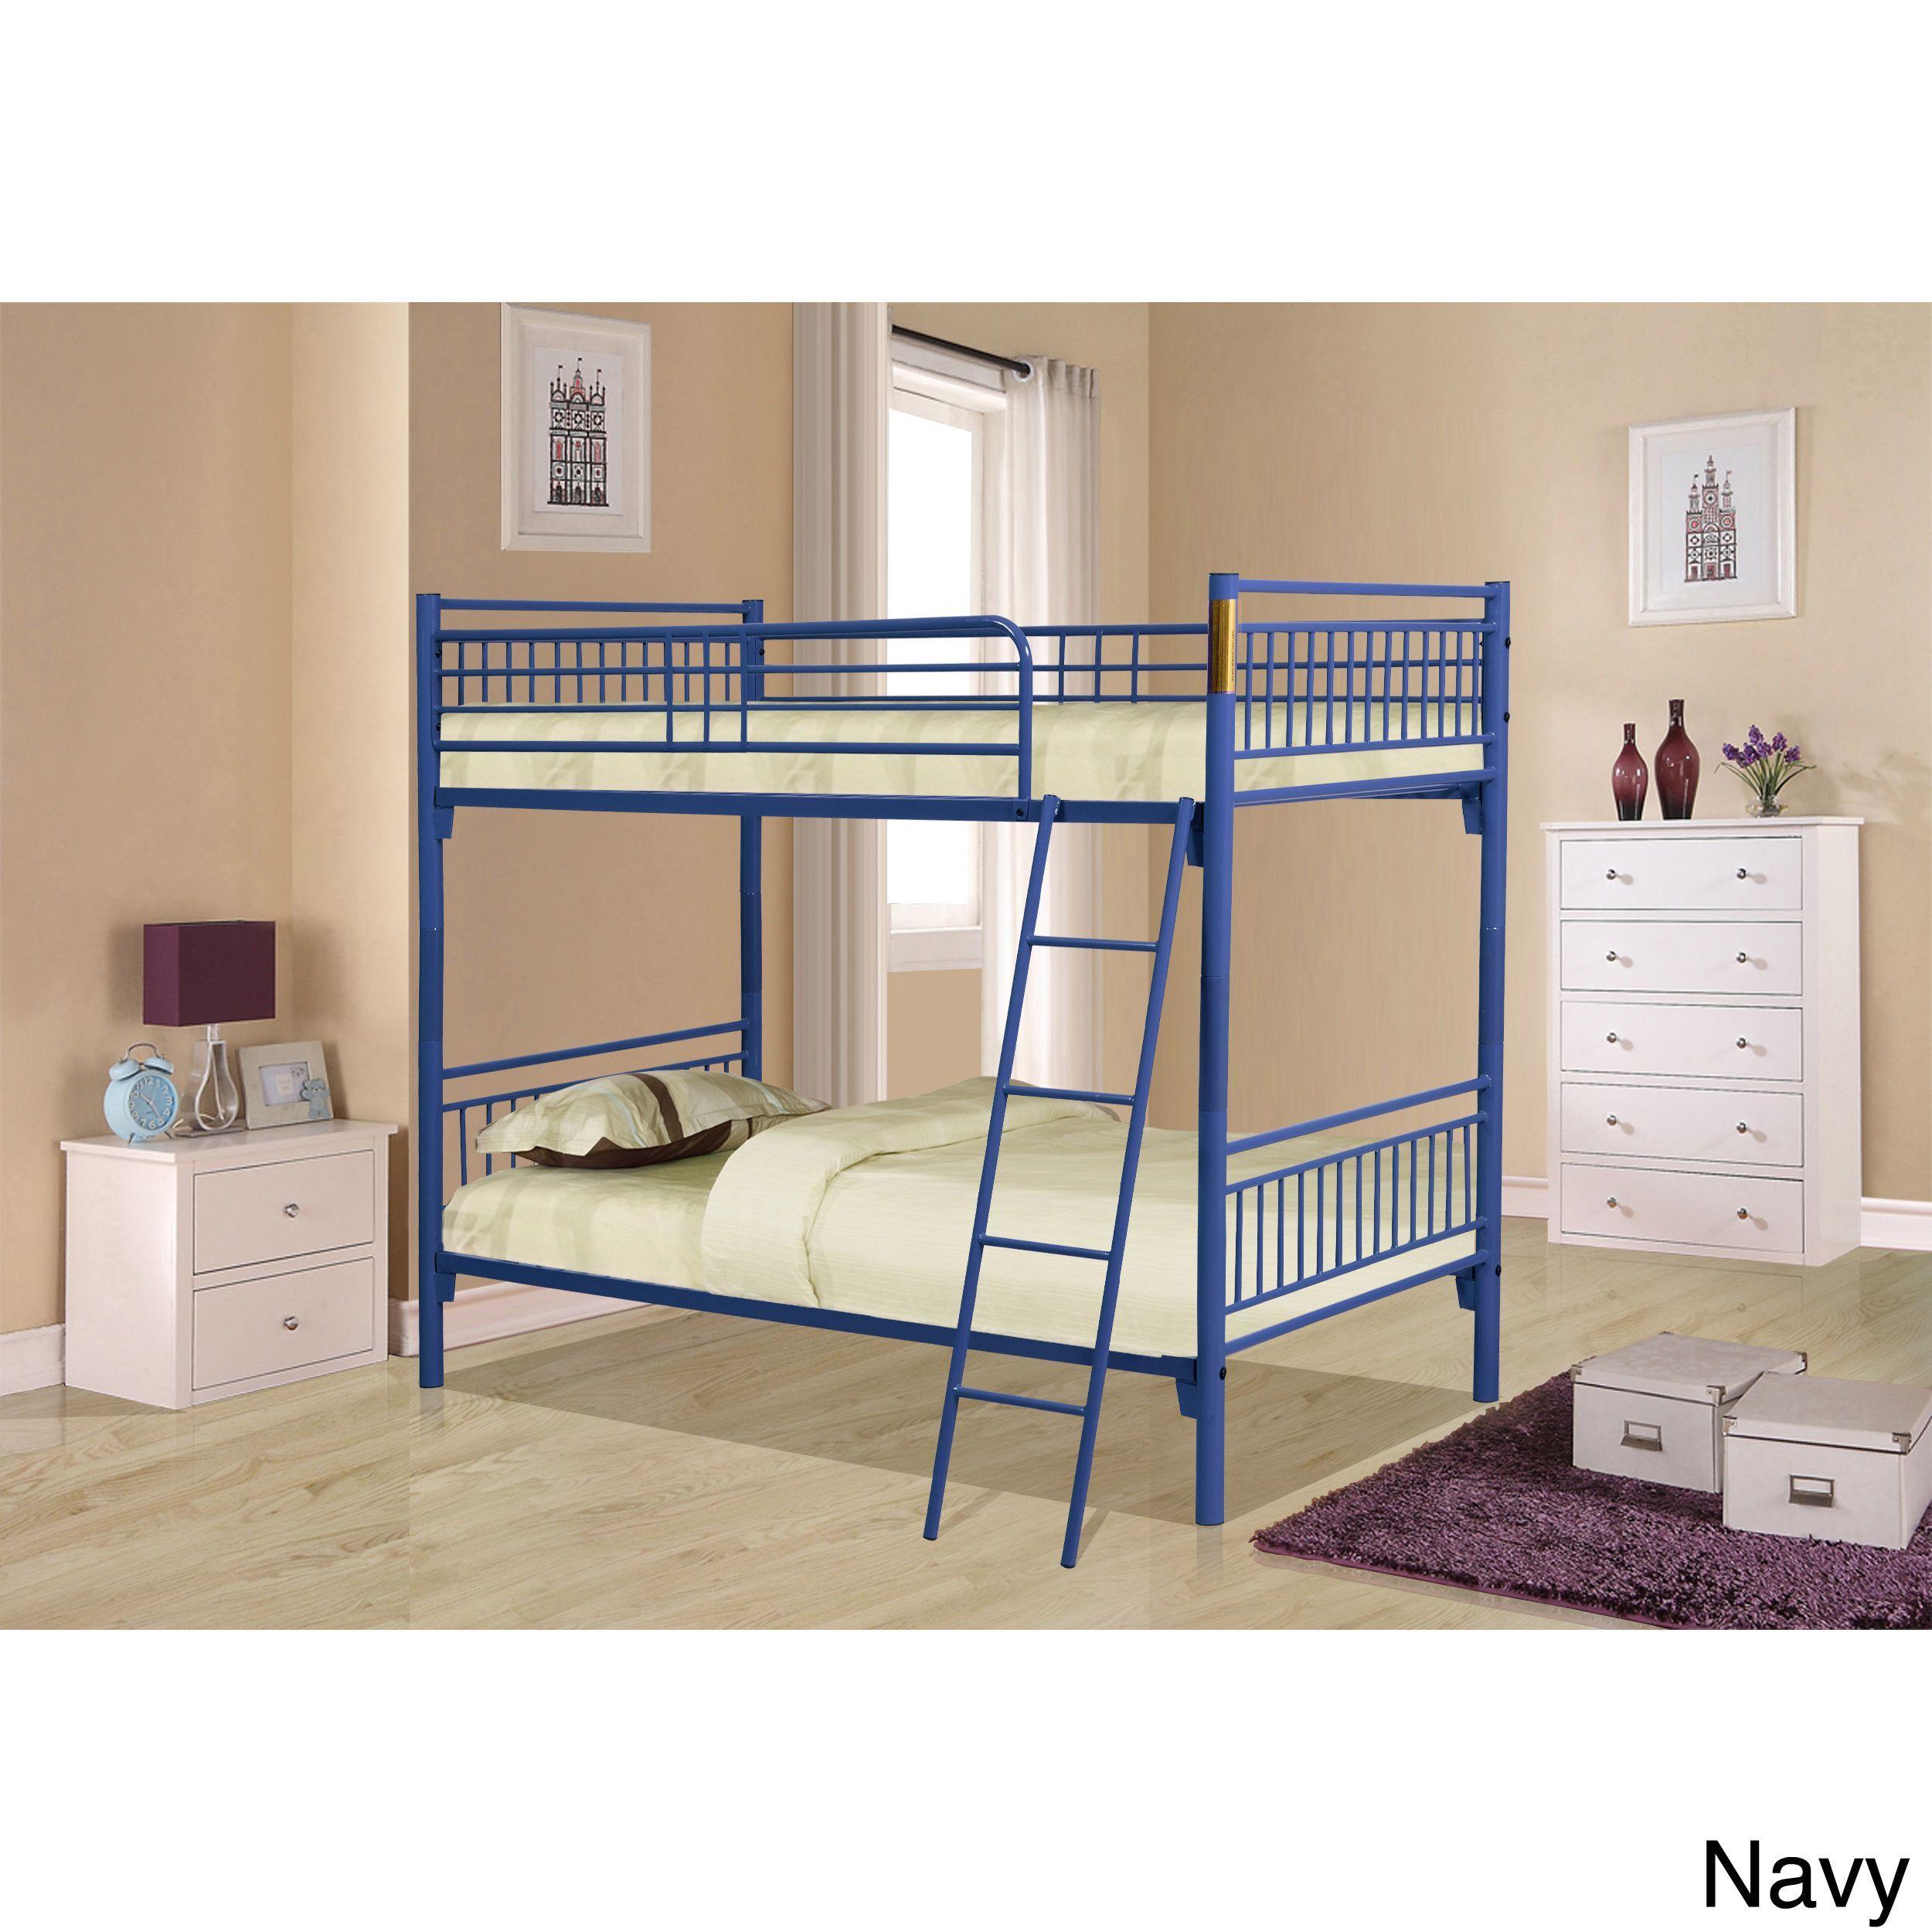 44f0cc7ad8fdd Bella Twin over Twin Metal Bunk Bed (Blue - Blue Finish)